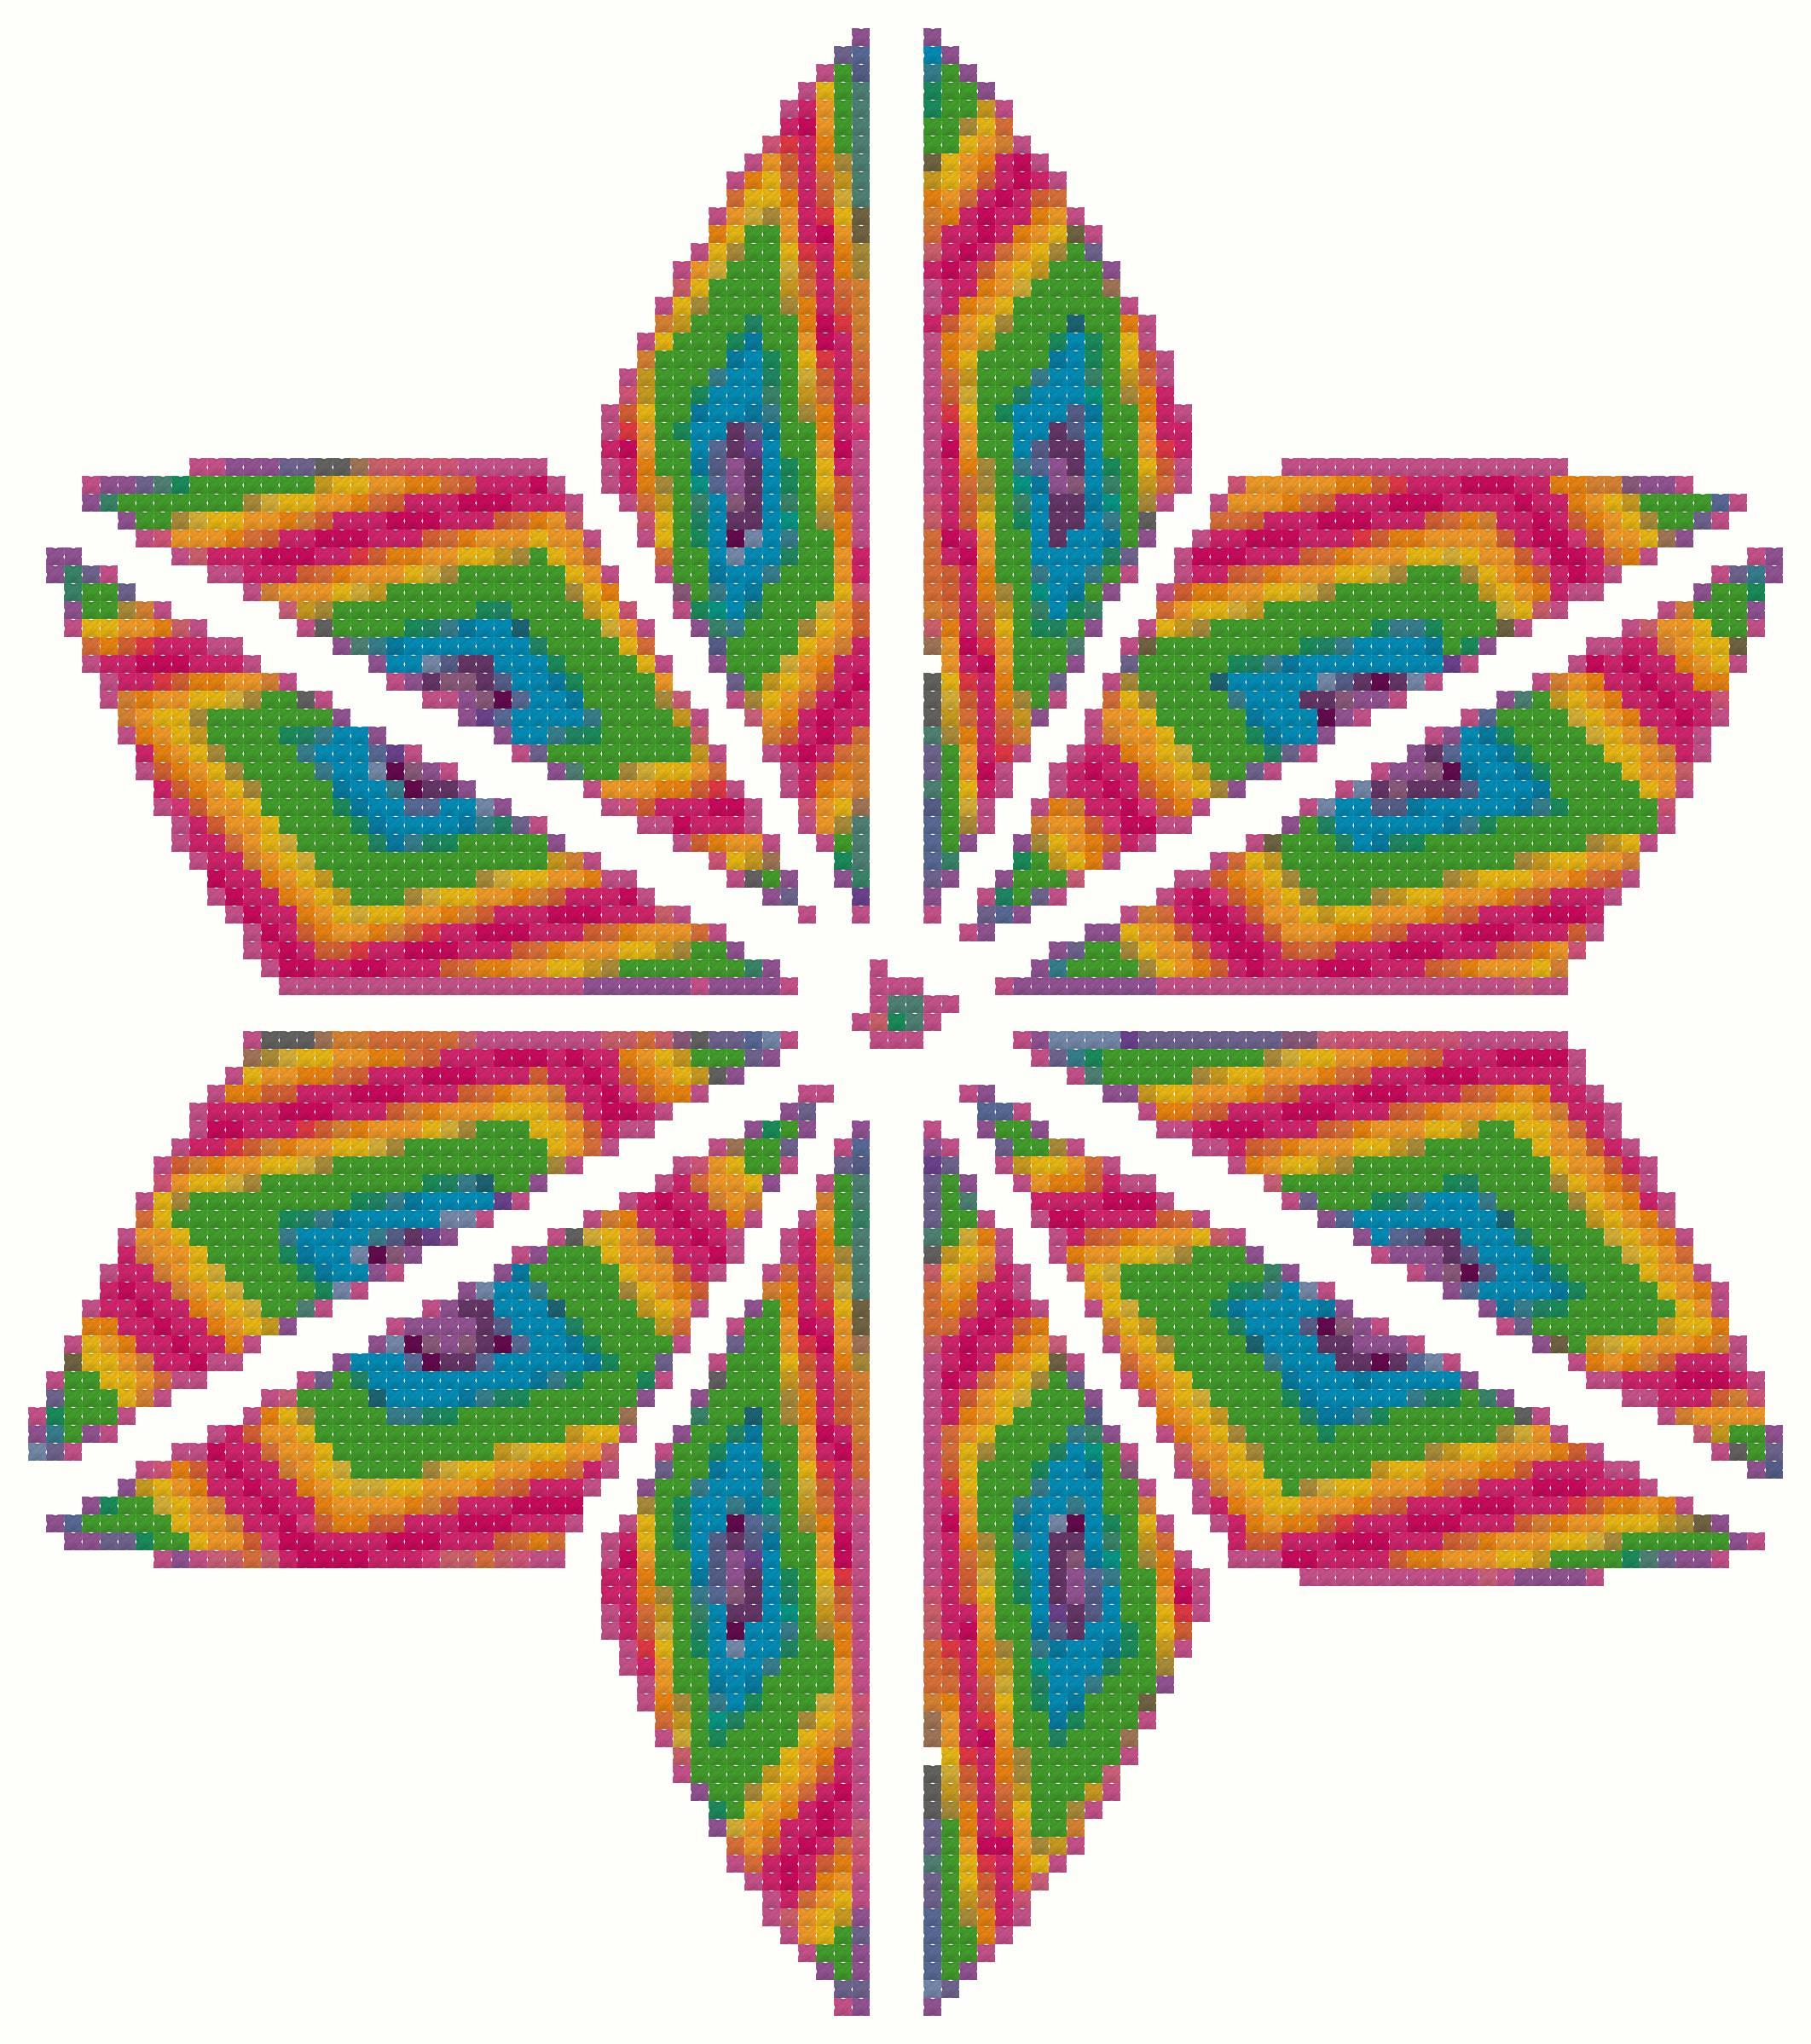 Motifs and Geometric